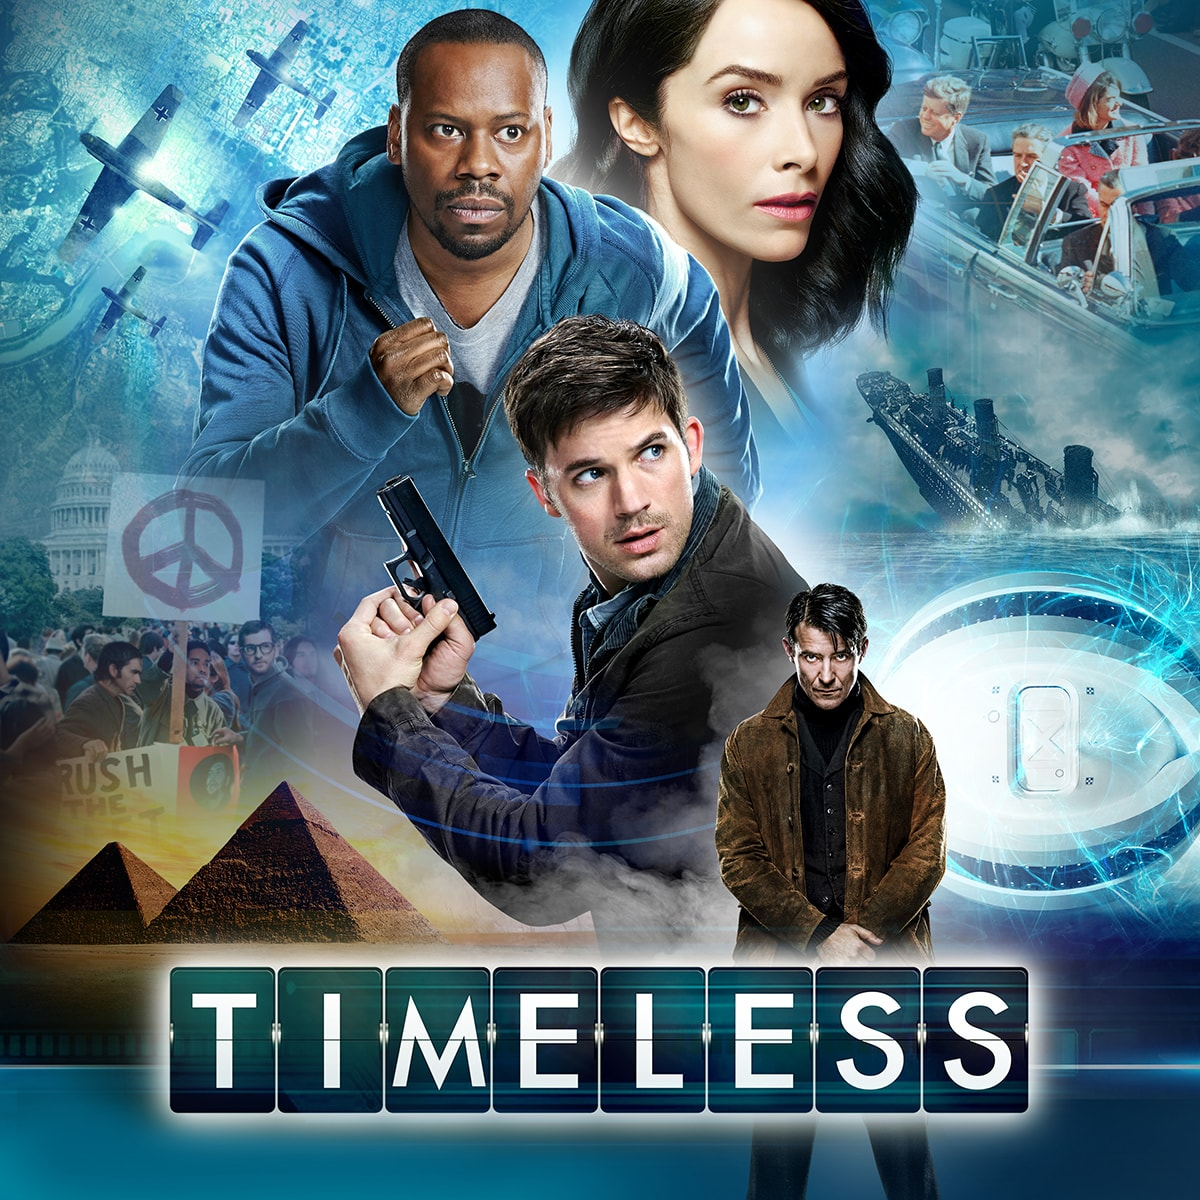 Timeless Nbc Promos Television Promos